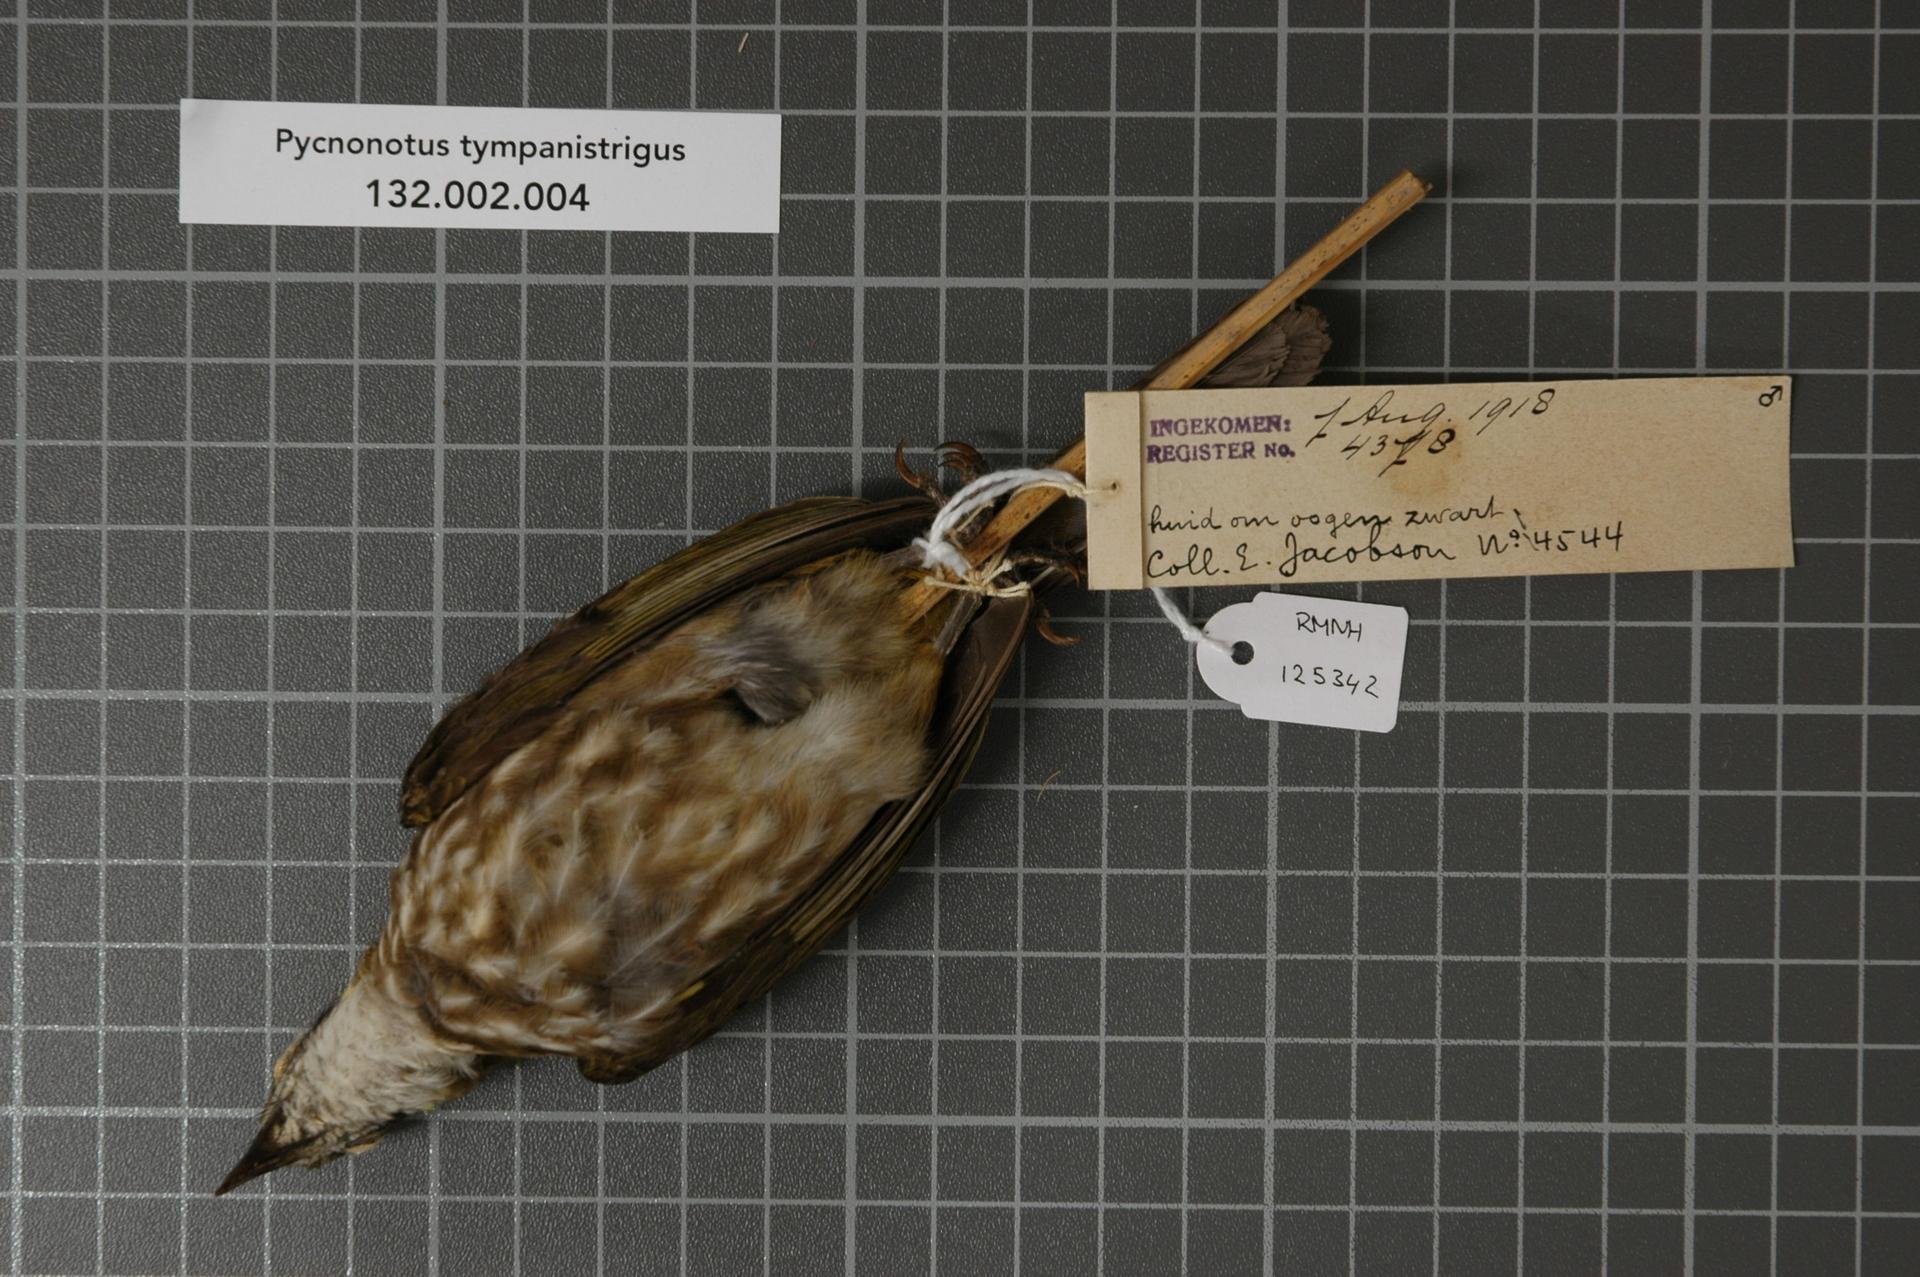 RMNH.AVES.125342   Pycnonotus tympanistrigus (S. Muller, 1835)